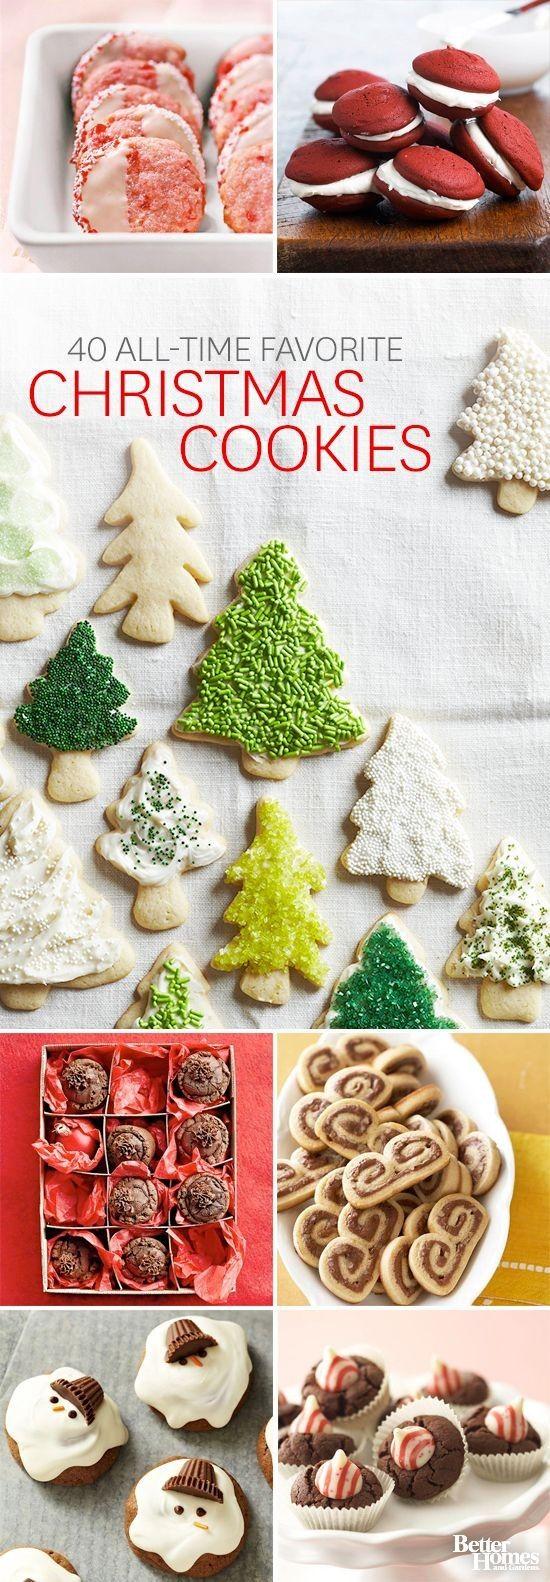 Christmas Cookies  http://thewhoot.com.au/media/slider/christmas-recipes